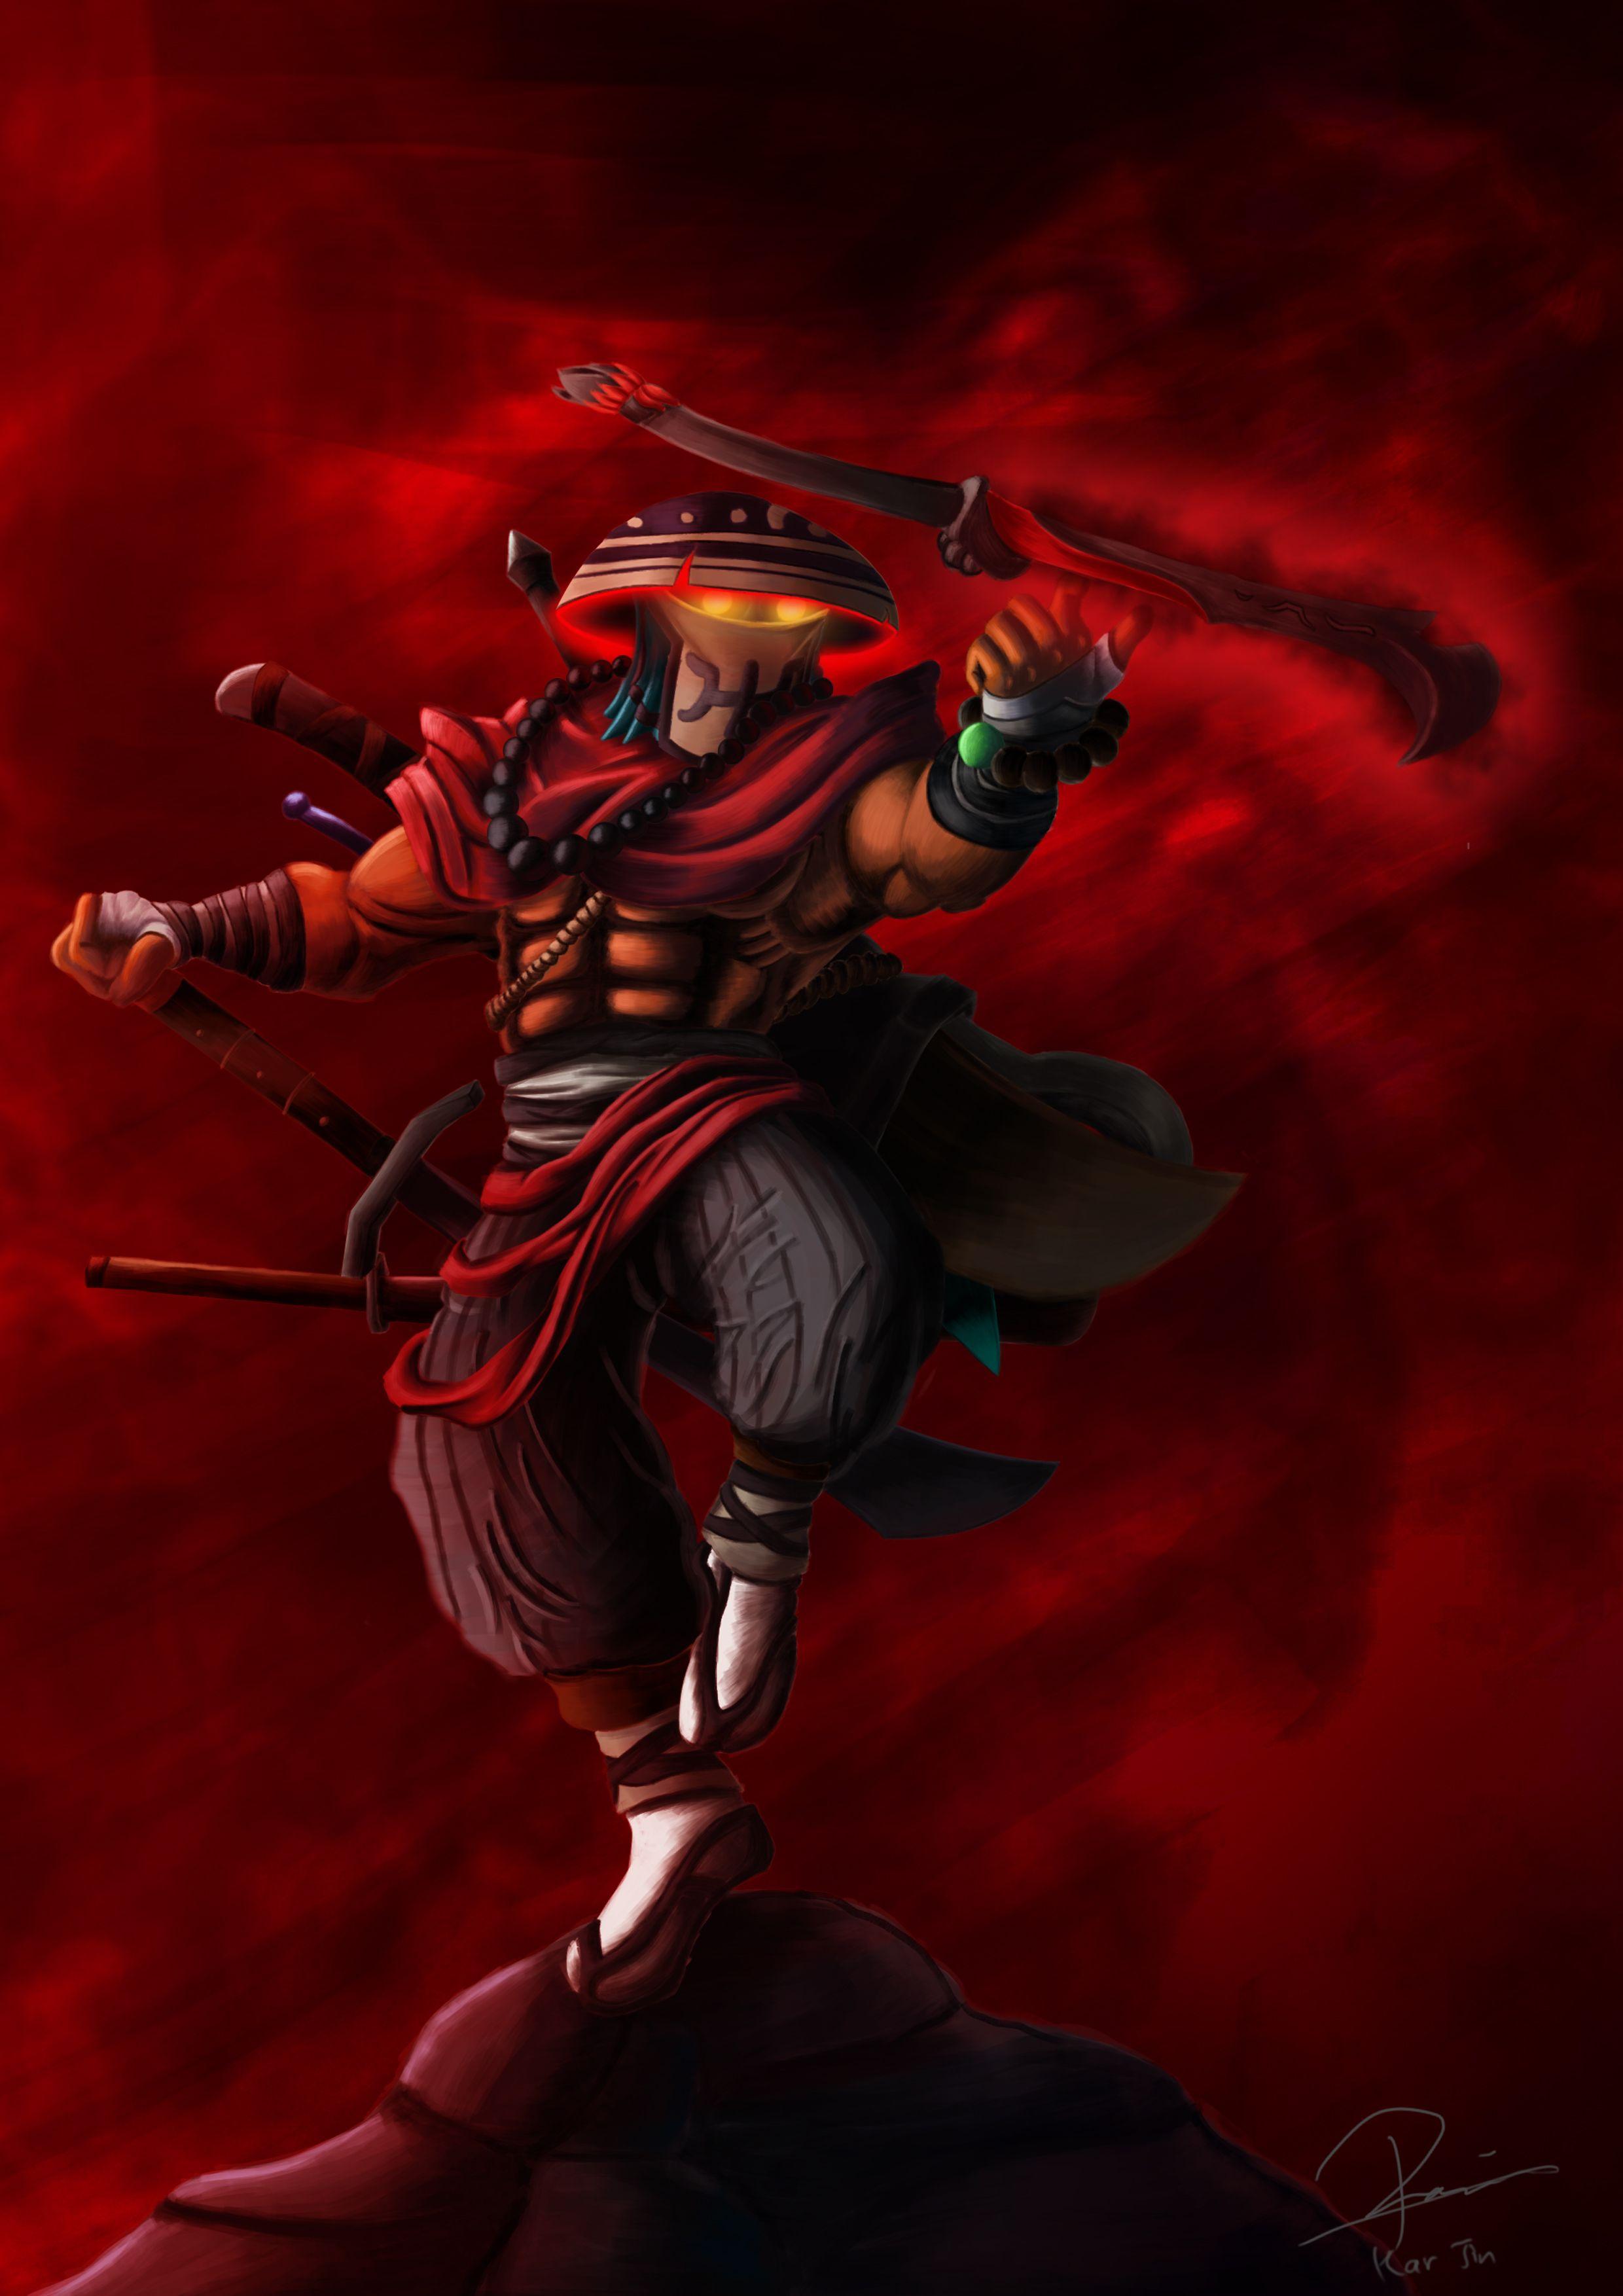 DOTA 2 Balance Of The Bladekeeper Juggernaut Dota Wallpaper Games Images